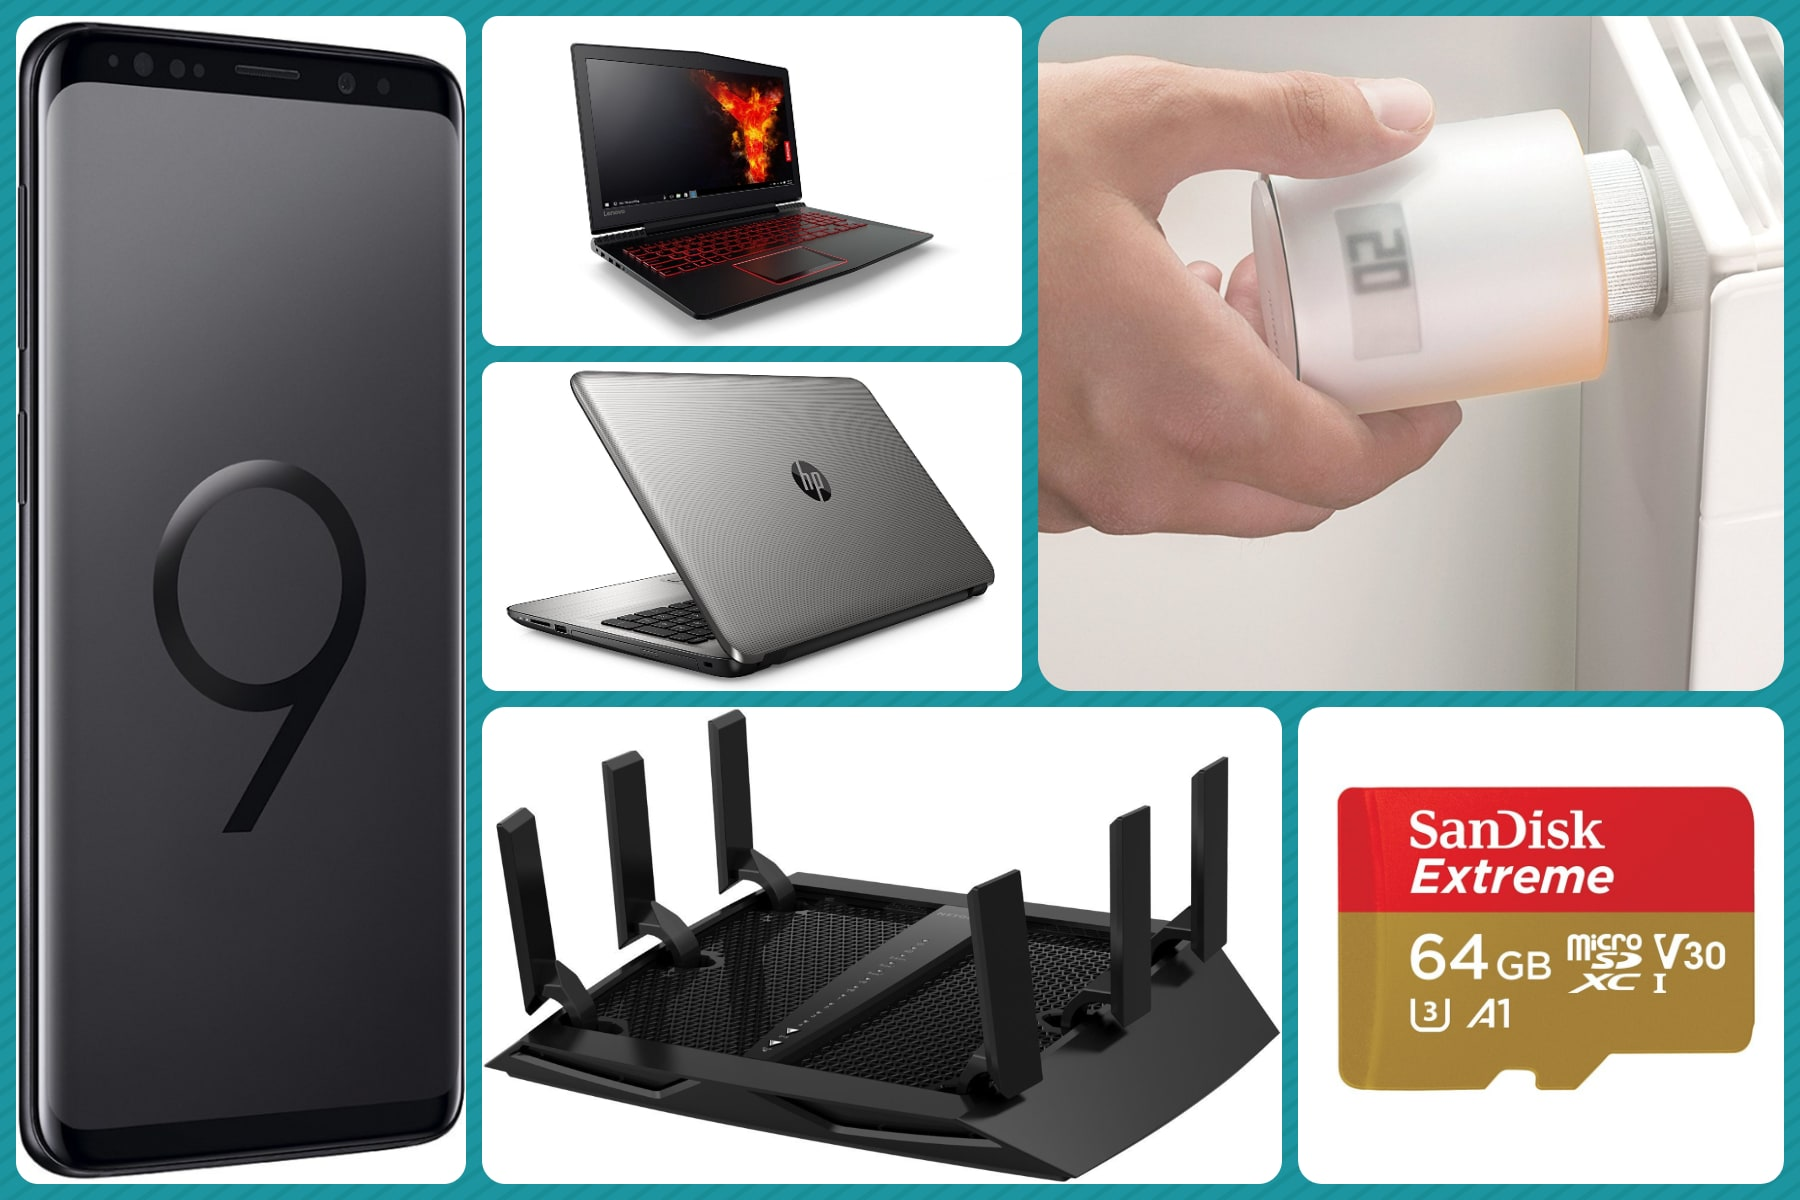 Su Amazon in offerta: Galaxy S9, power bank wireless, Hero Session, cuffie gaming - image Migliori-offerte-Amazon-20-marzo-2018 on http://www.zxbyte.com